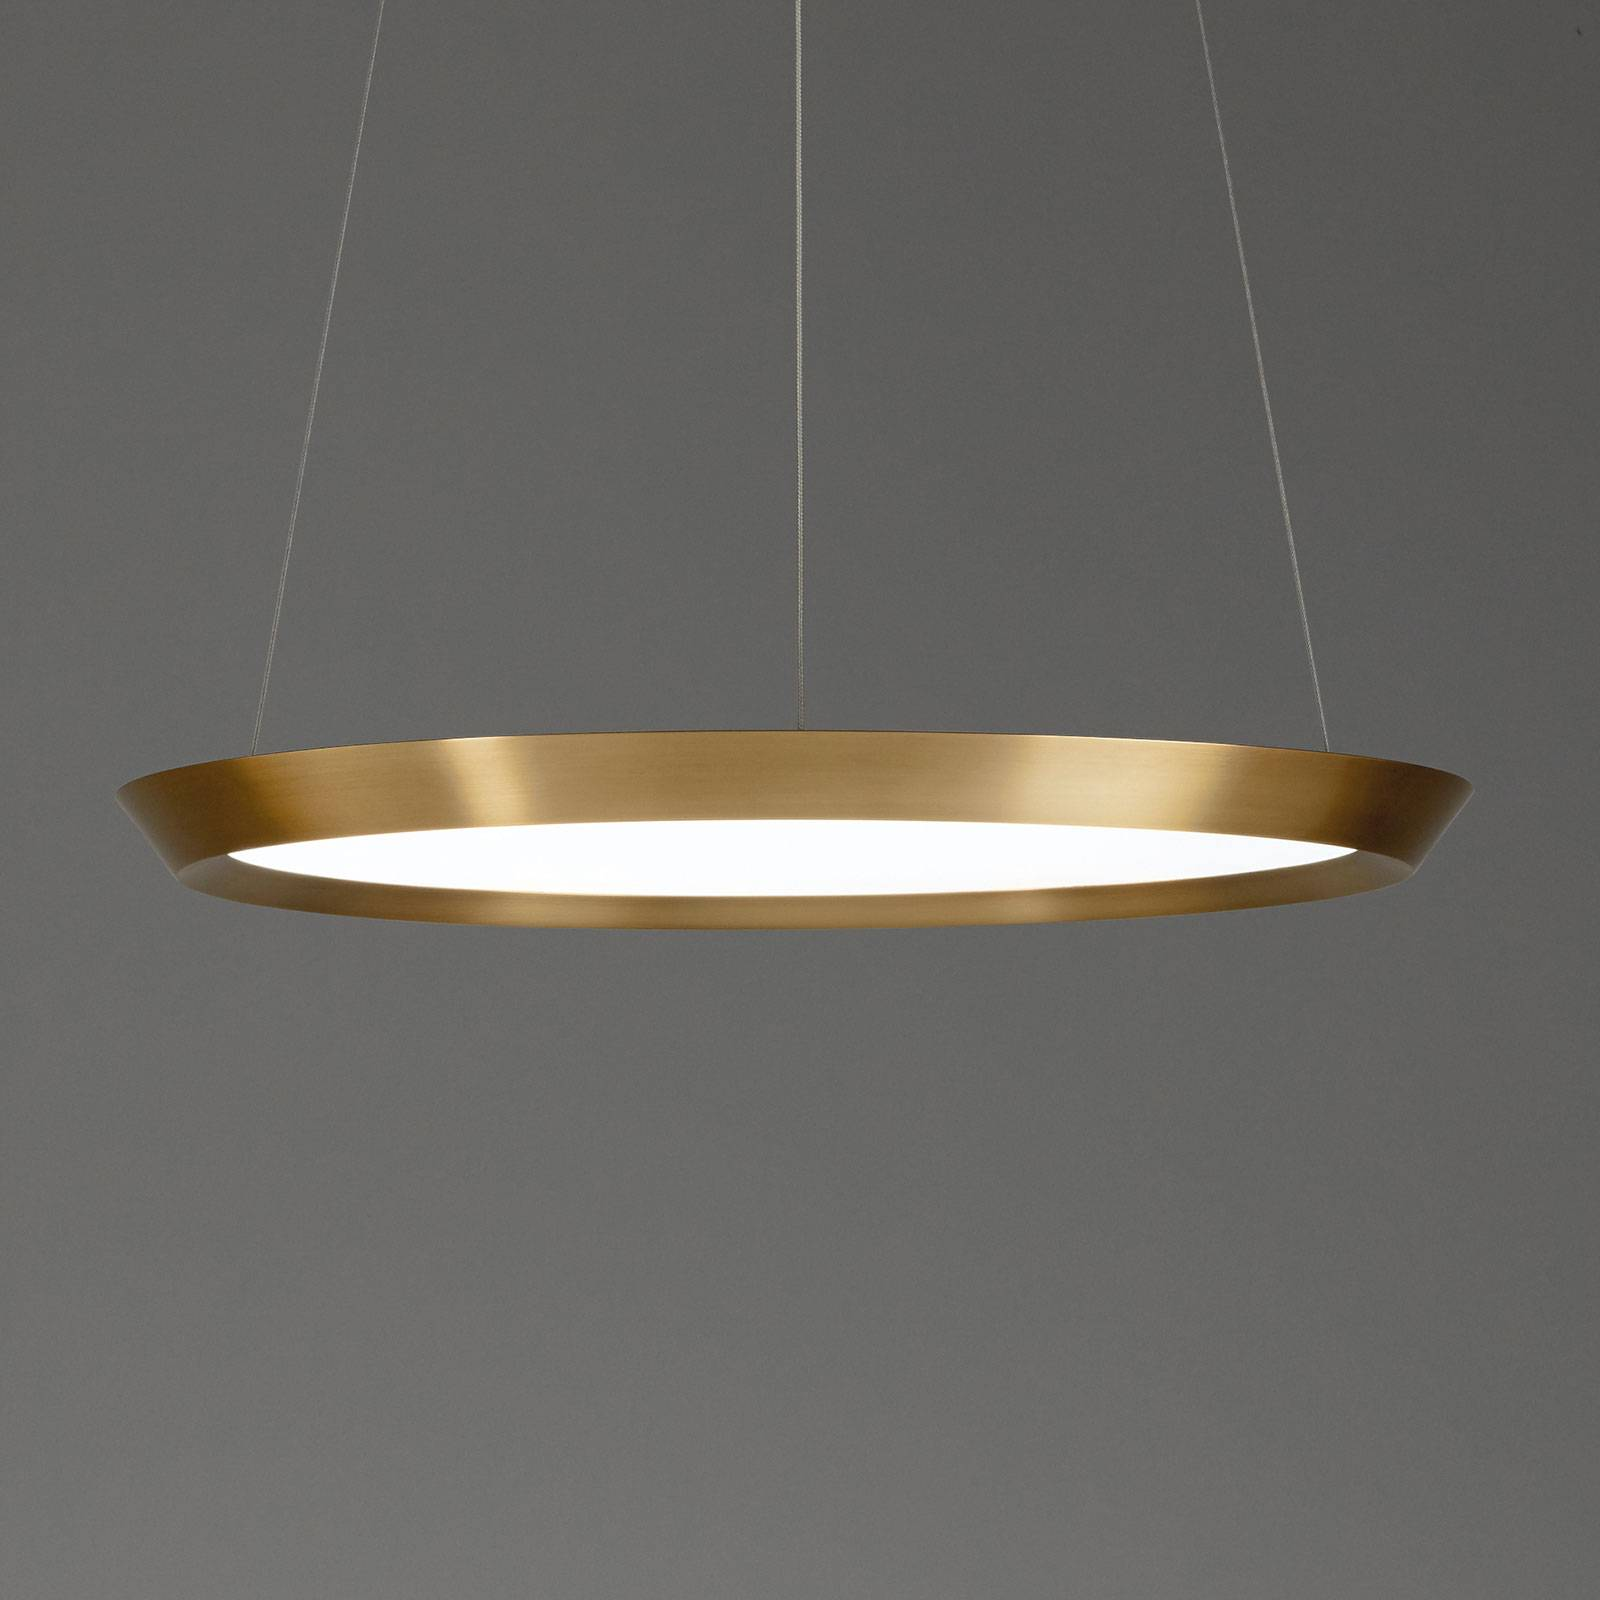 Grok Saturn -LED-riippuvalaisin, messinki, Ø 60 cm